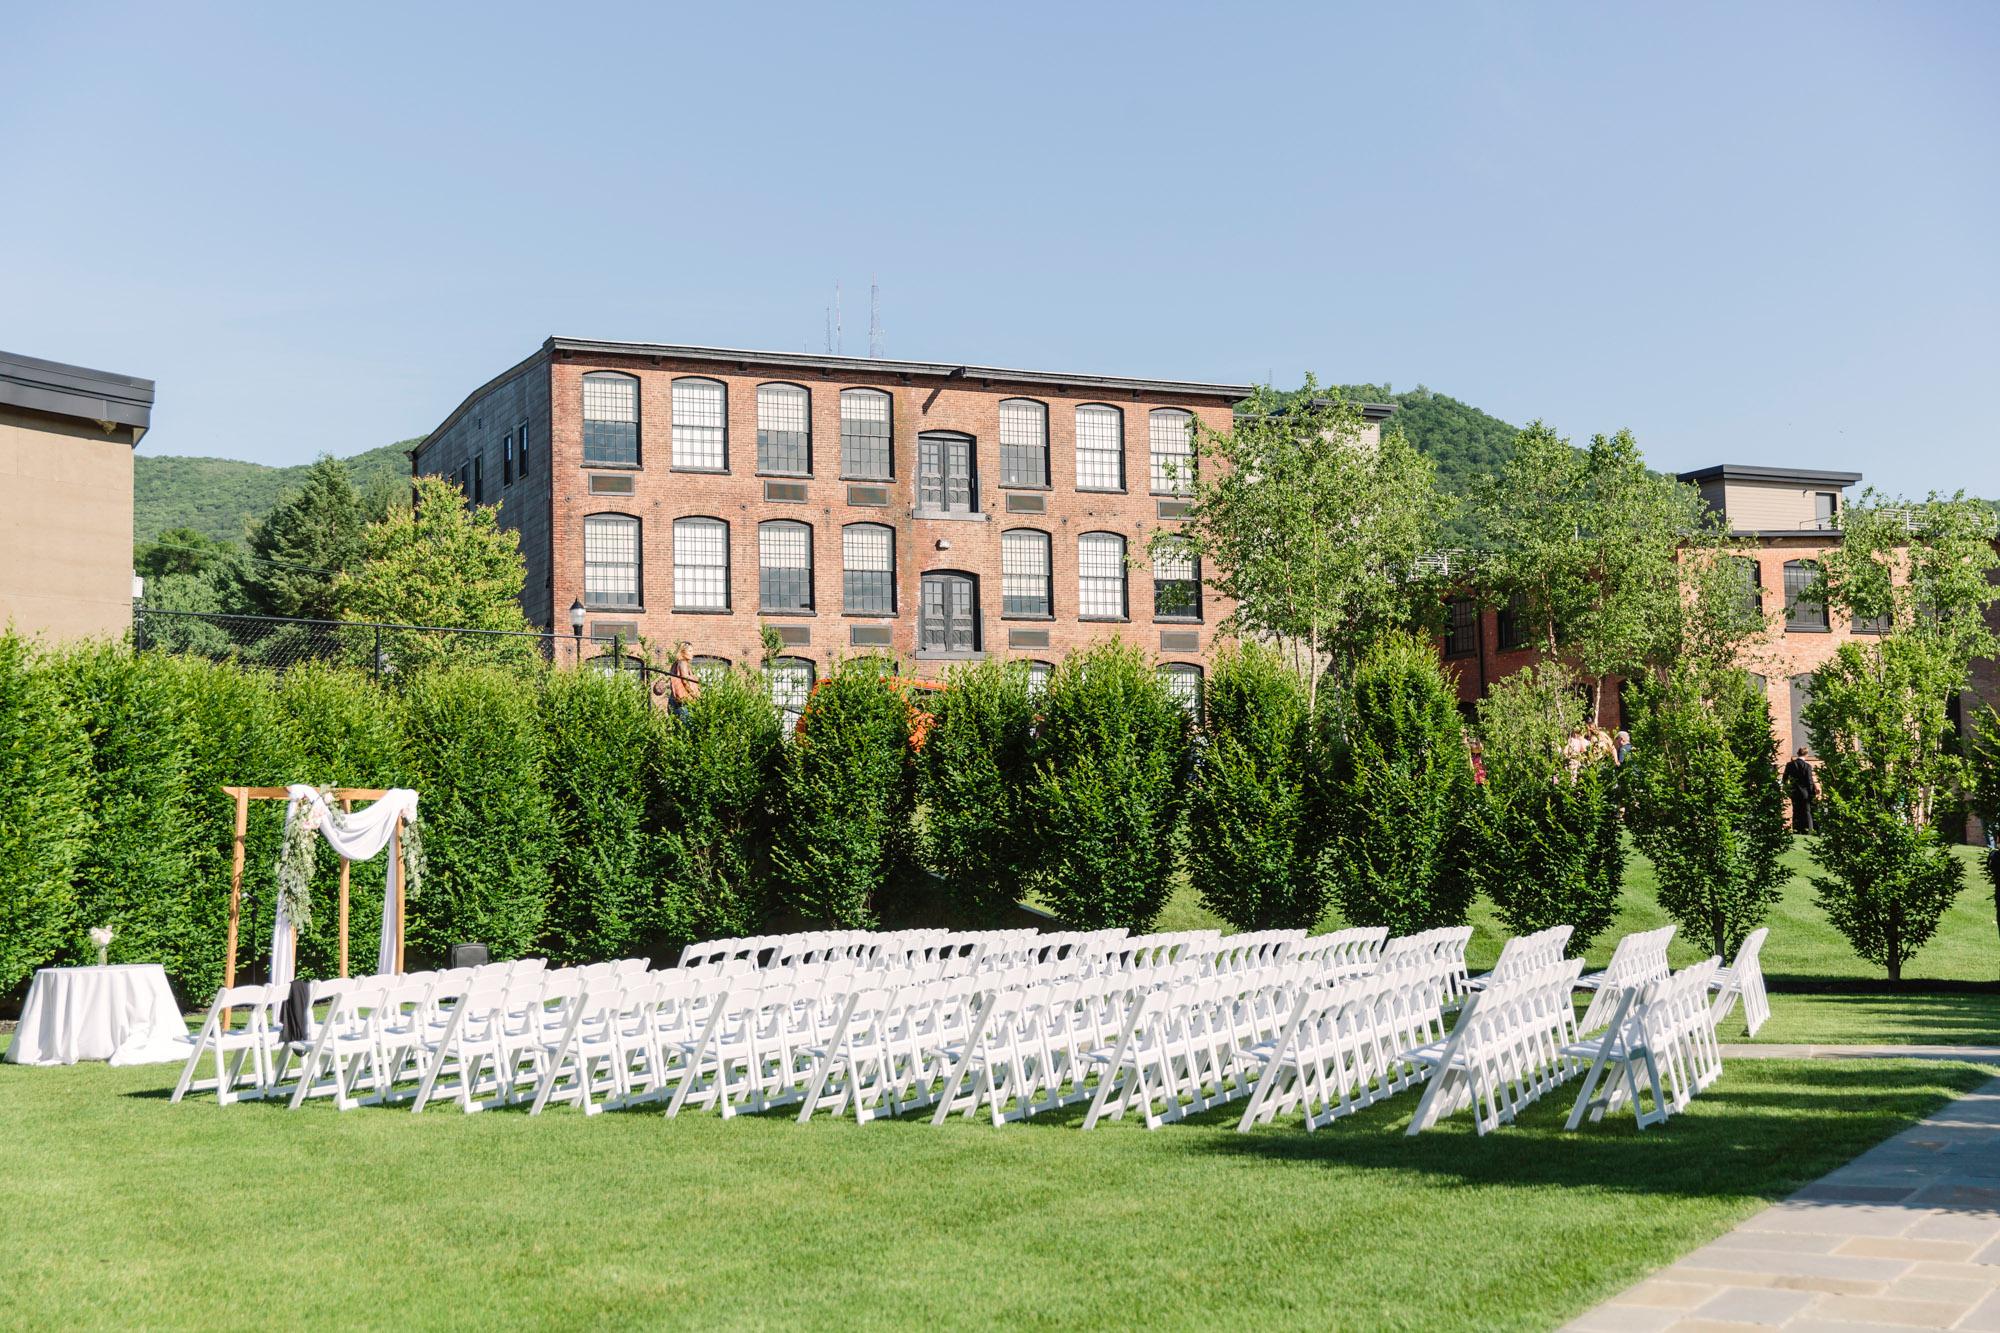 40_Rowan_Brian_The_Roundhouse_Wedding_Beacon_NY_Tanya_Salazar_Photography_1134.jpg